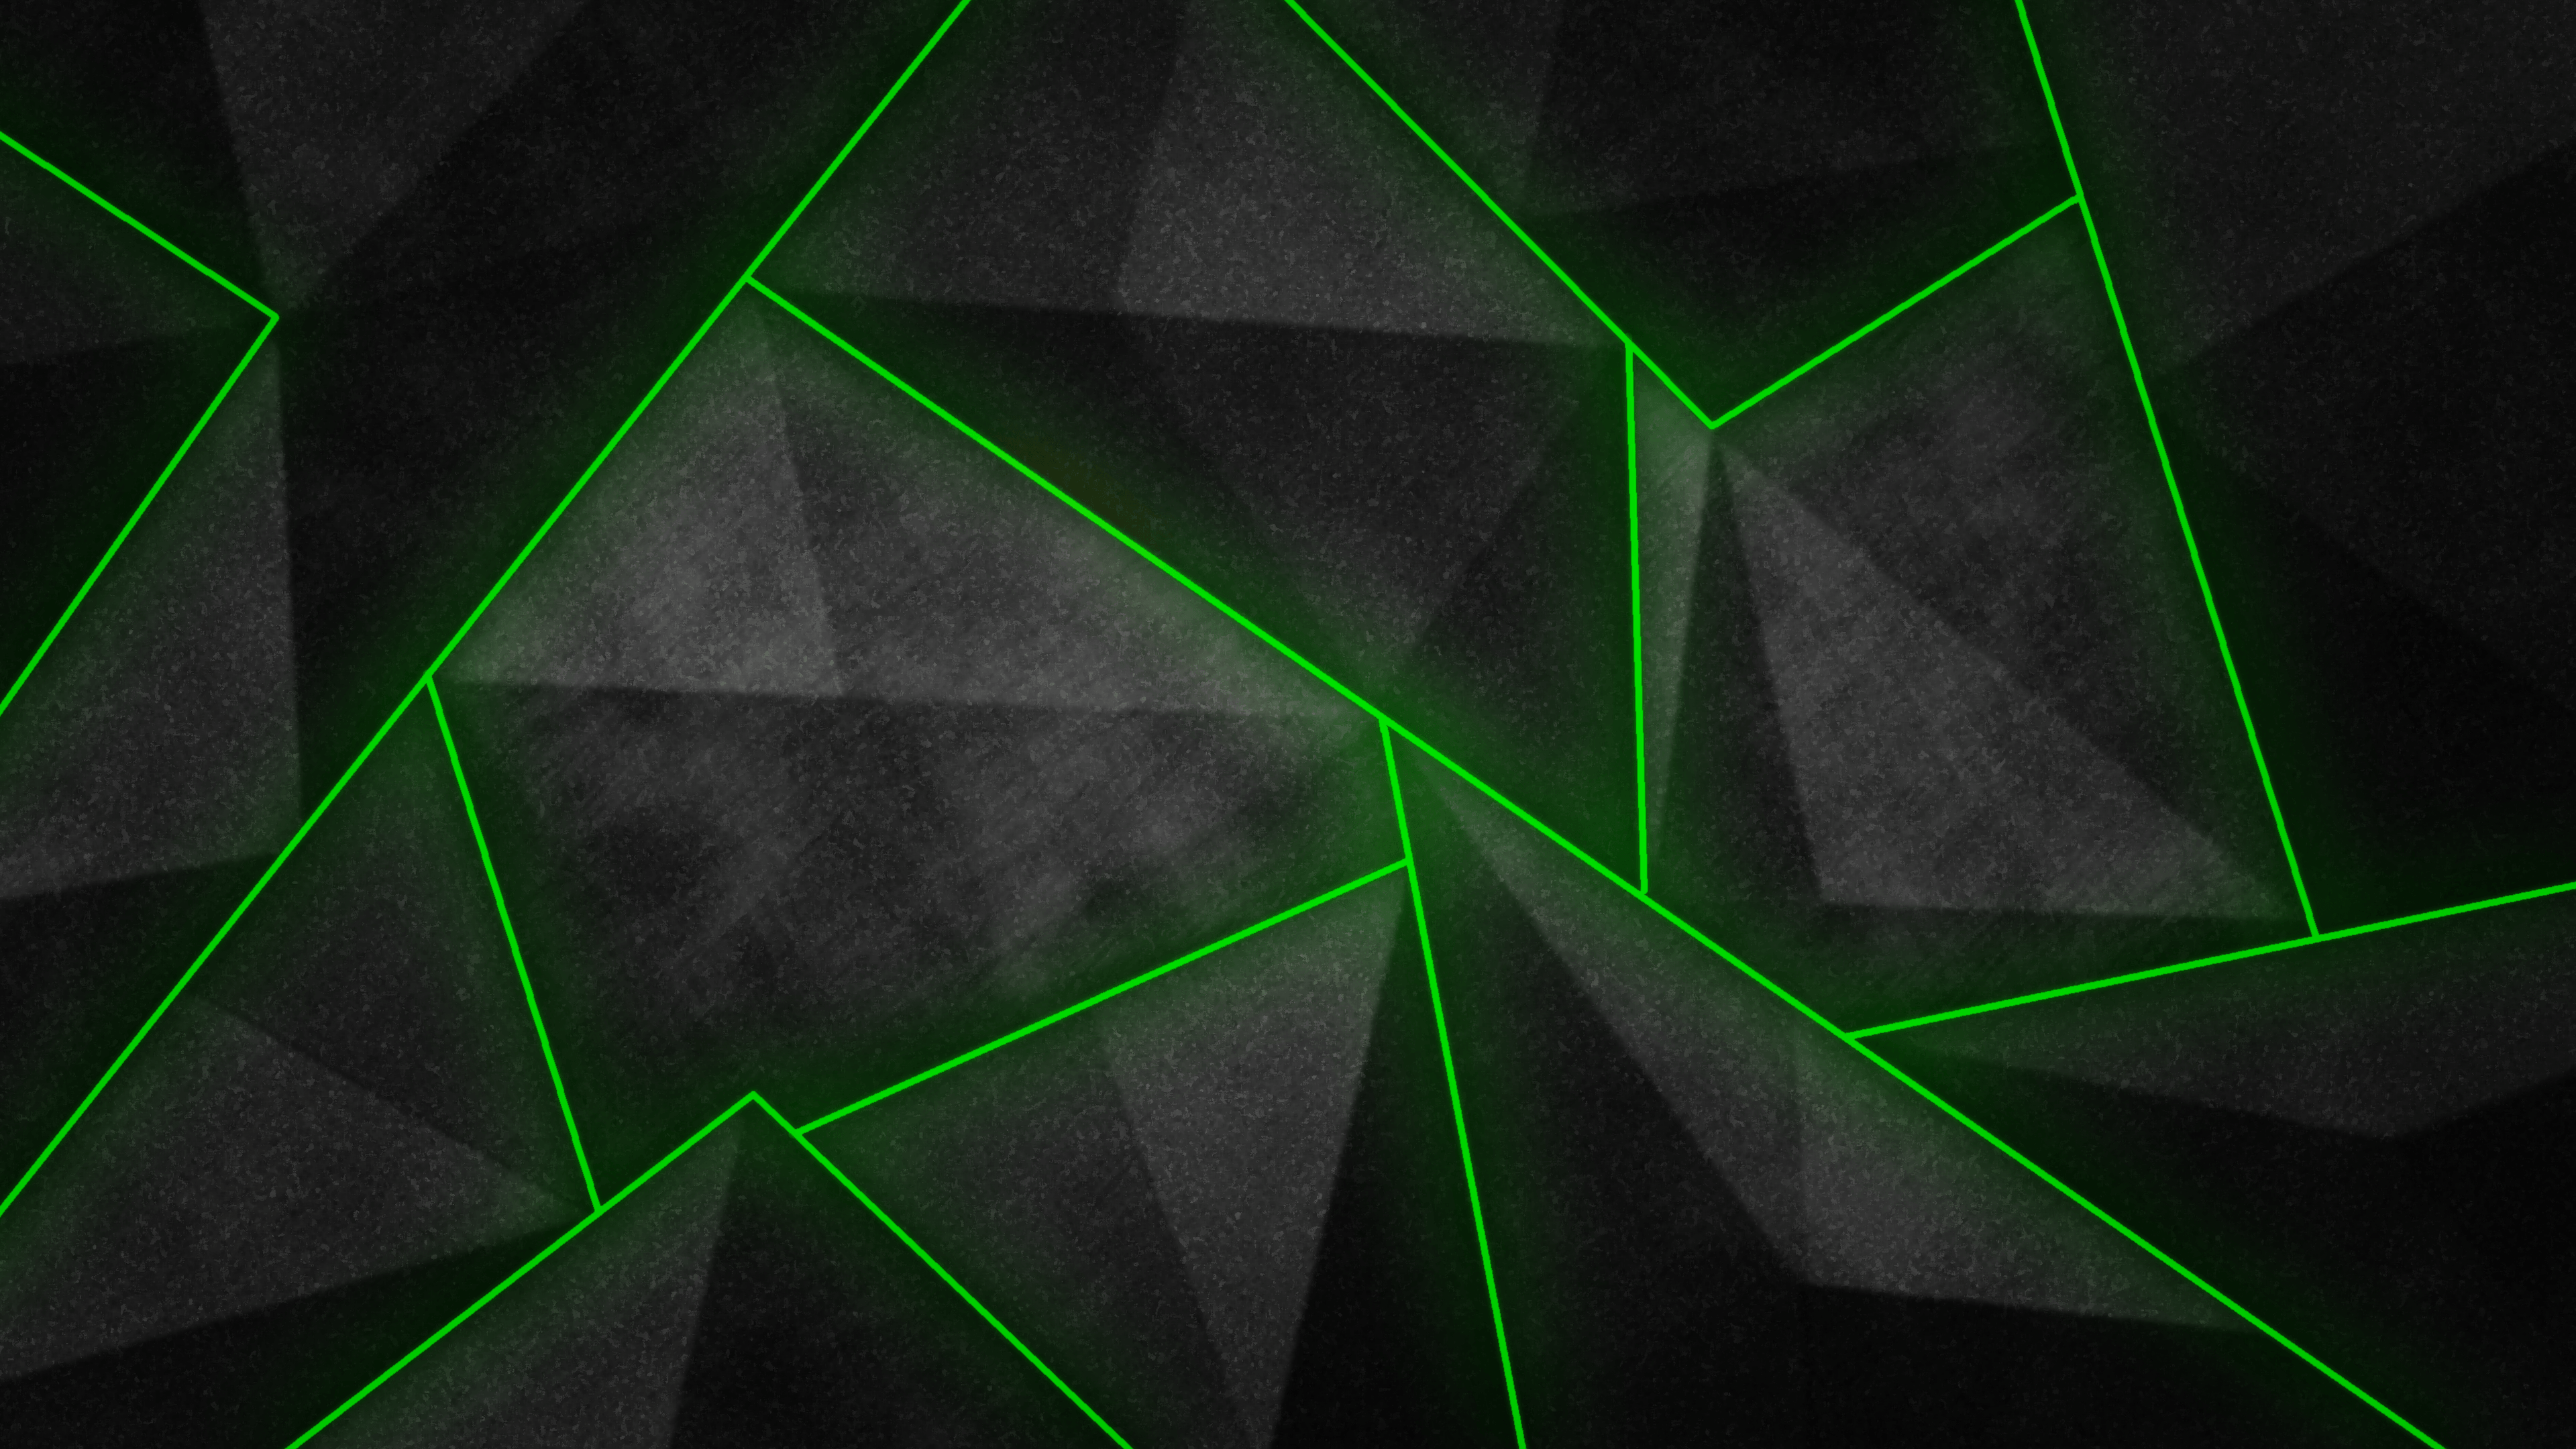 Wallpapers Black Green - Wallpaper Cave